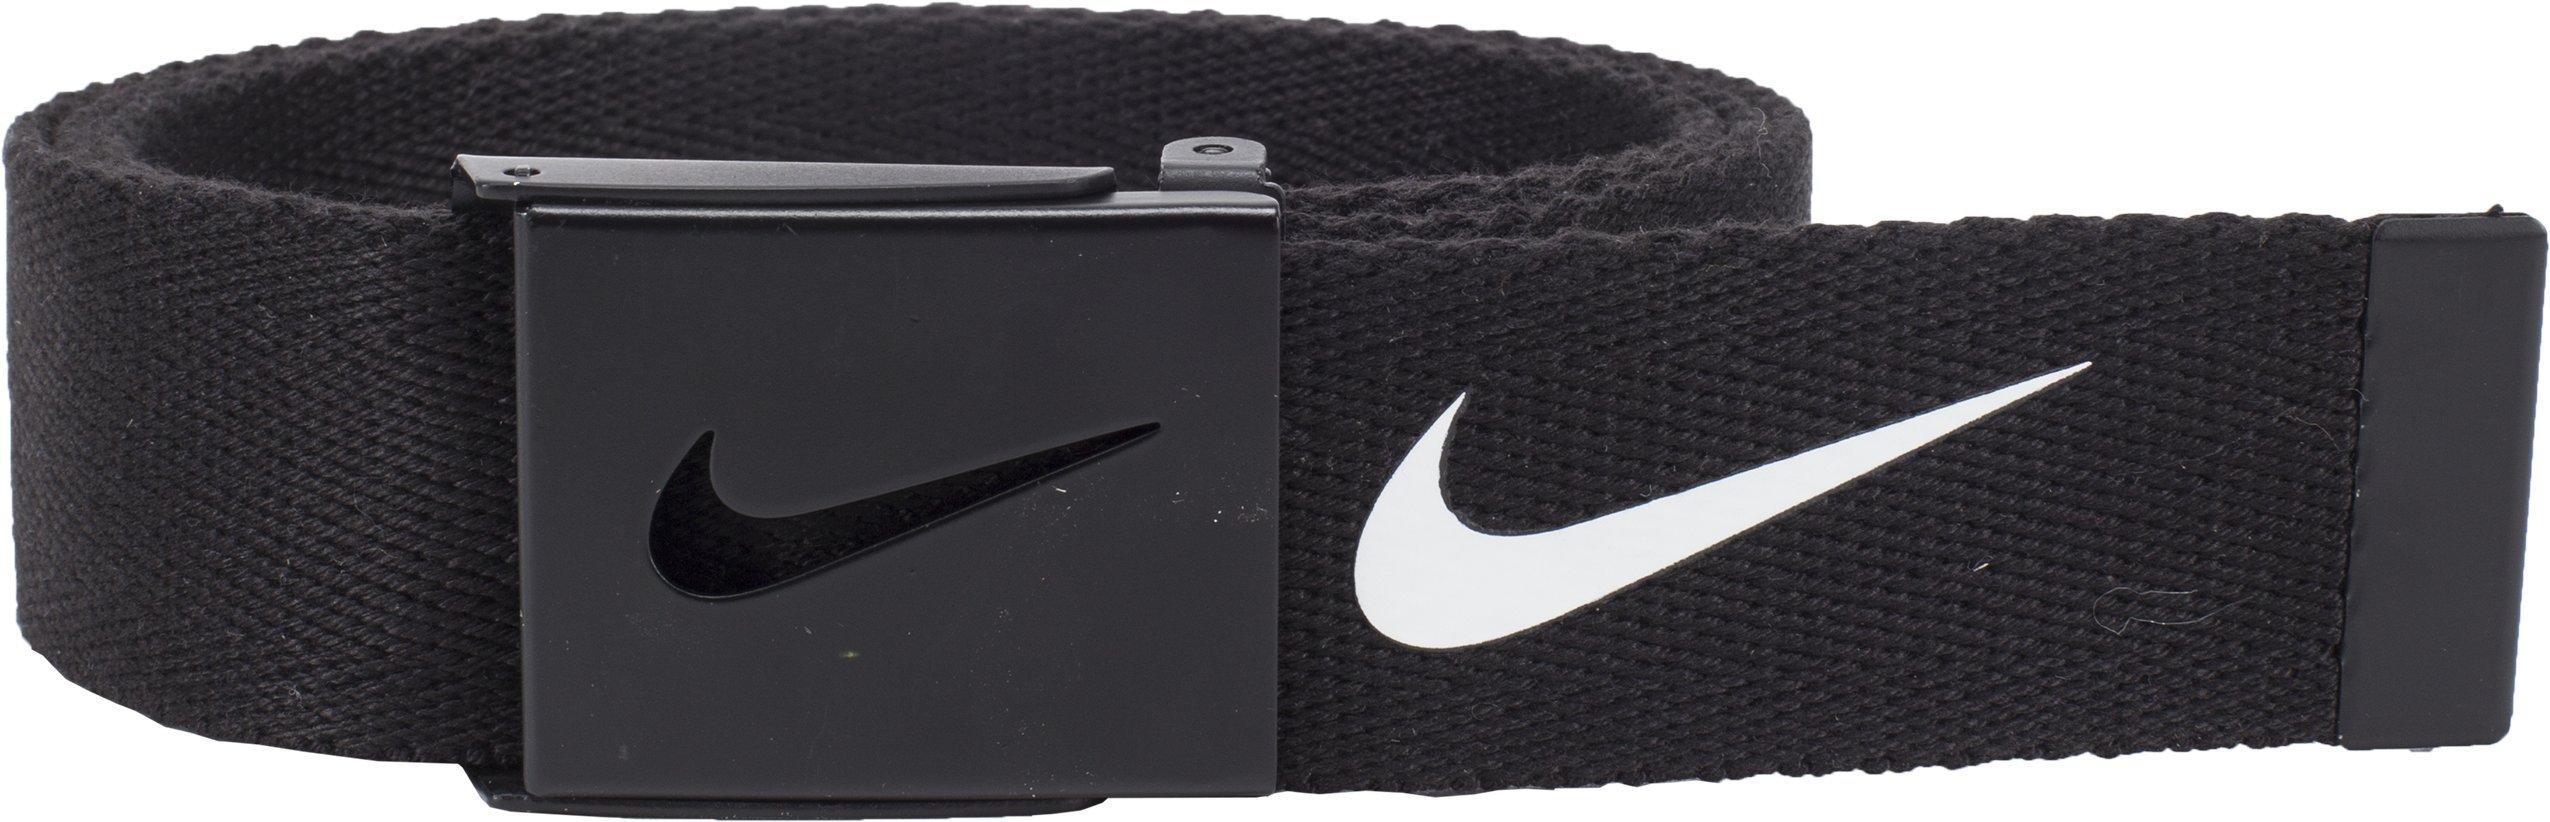 Nike Men's Tech Essential Web Belt, Black, One Size